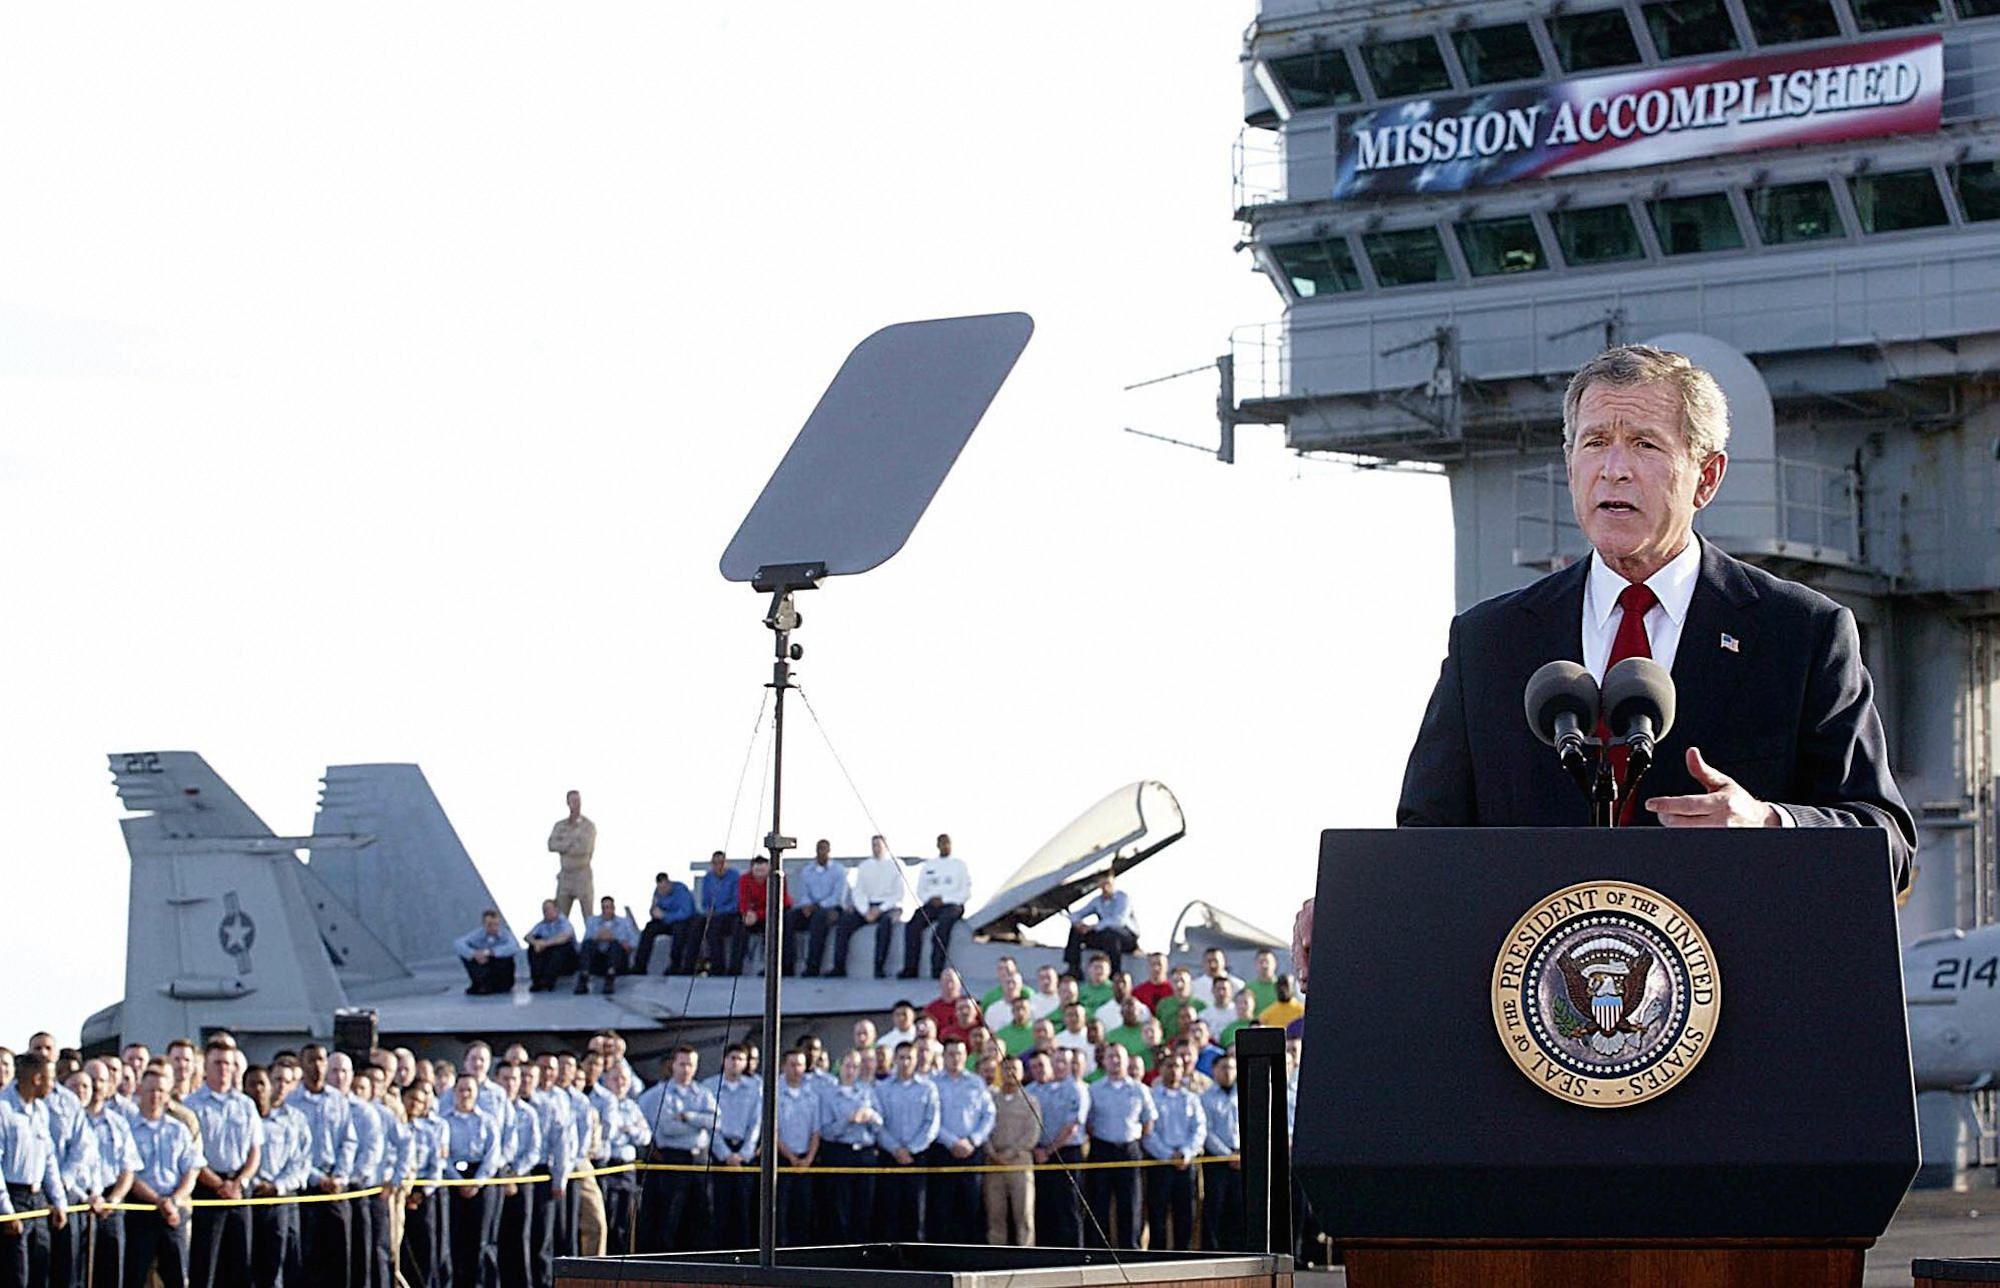 George W.'s Biographer Explains How Bush Family Failures Led to Donald Trump's Success